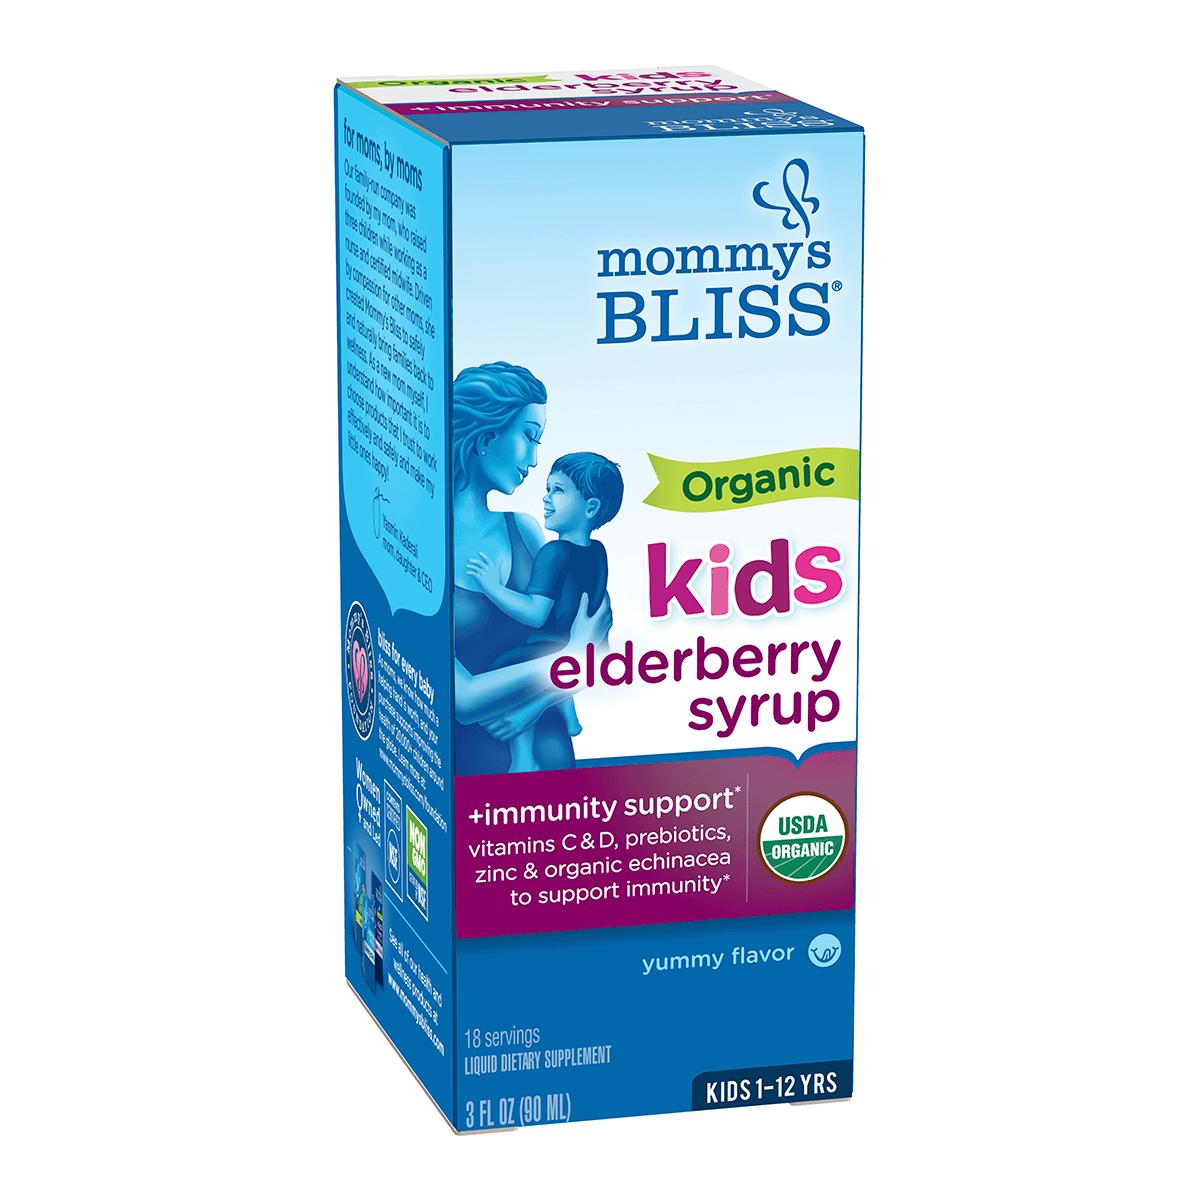 product-1-Kid's-Elderberry-Syrup-Organic